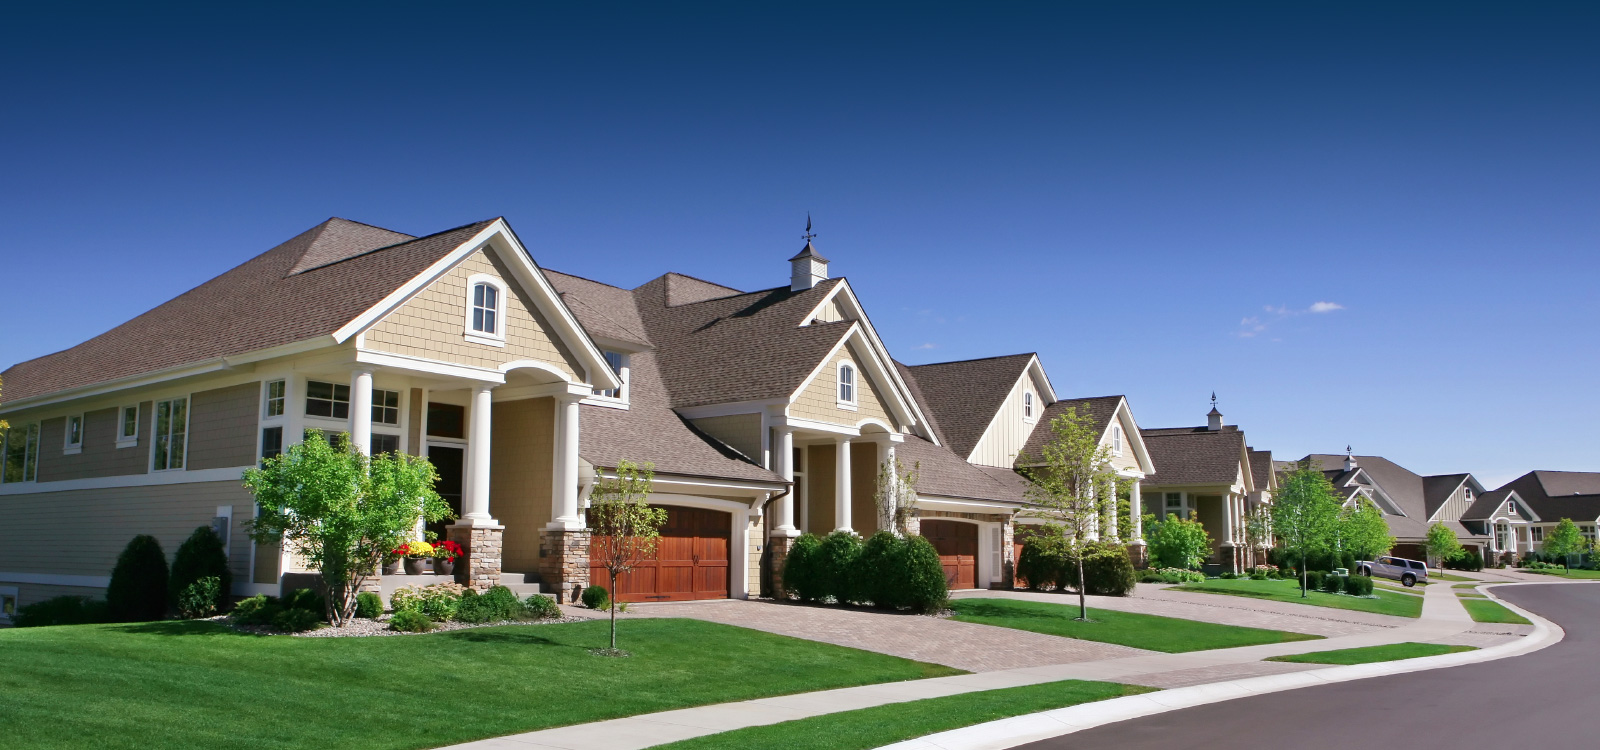 Home Inspection Checklist Hamilton